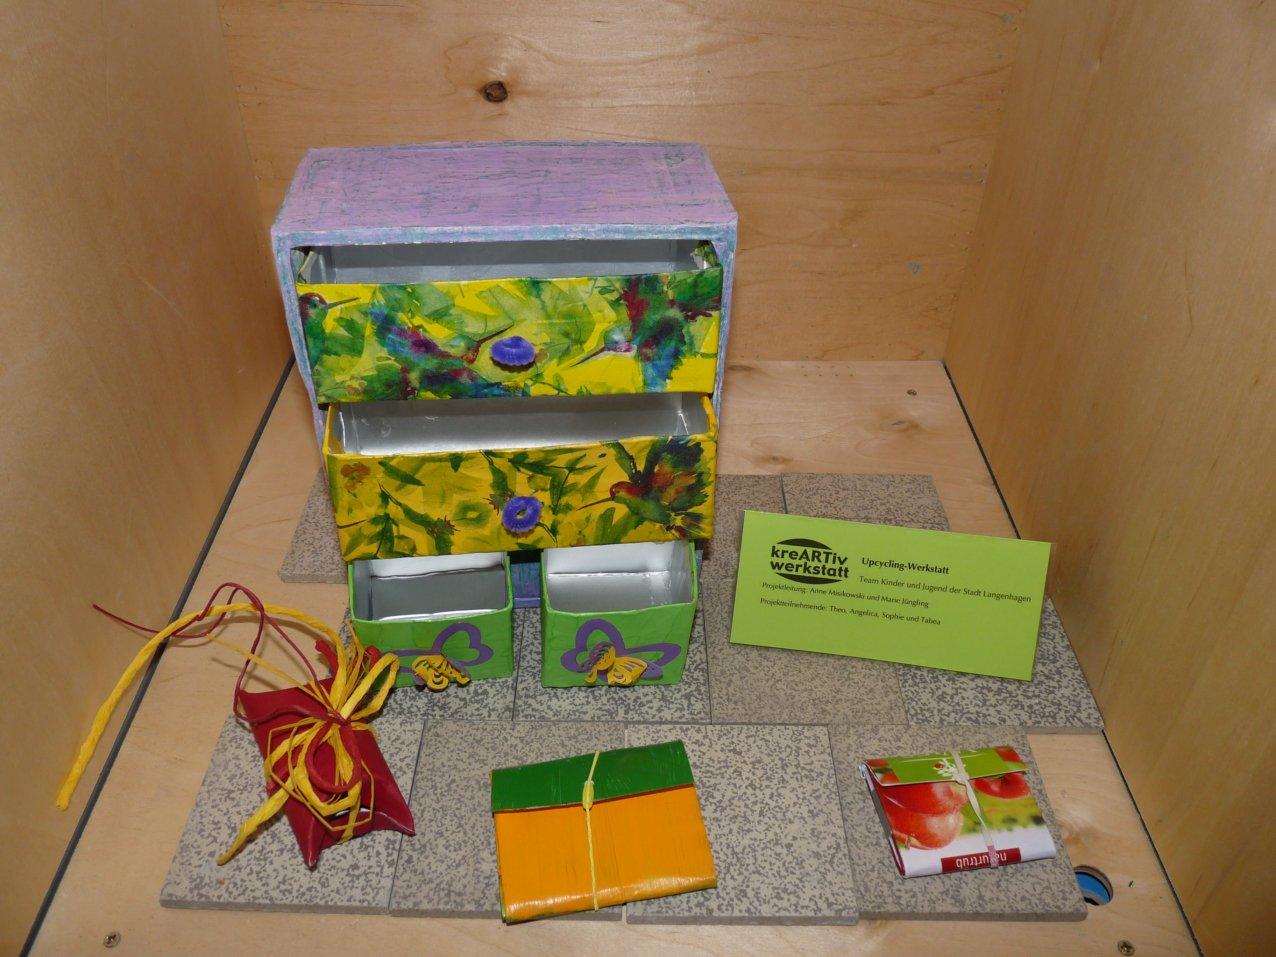 upcycling-mit-verbundverpackungen-k